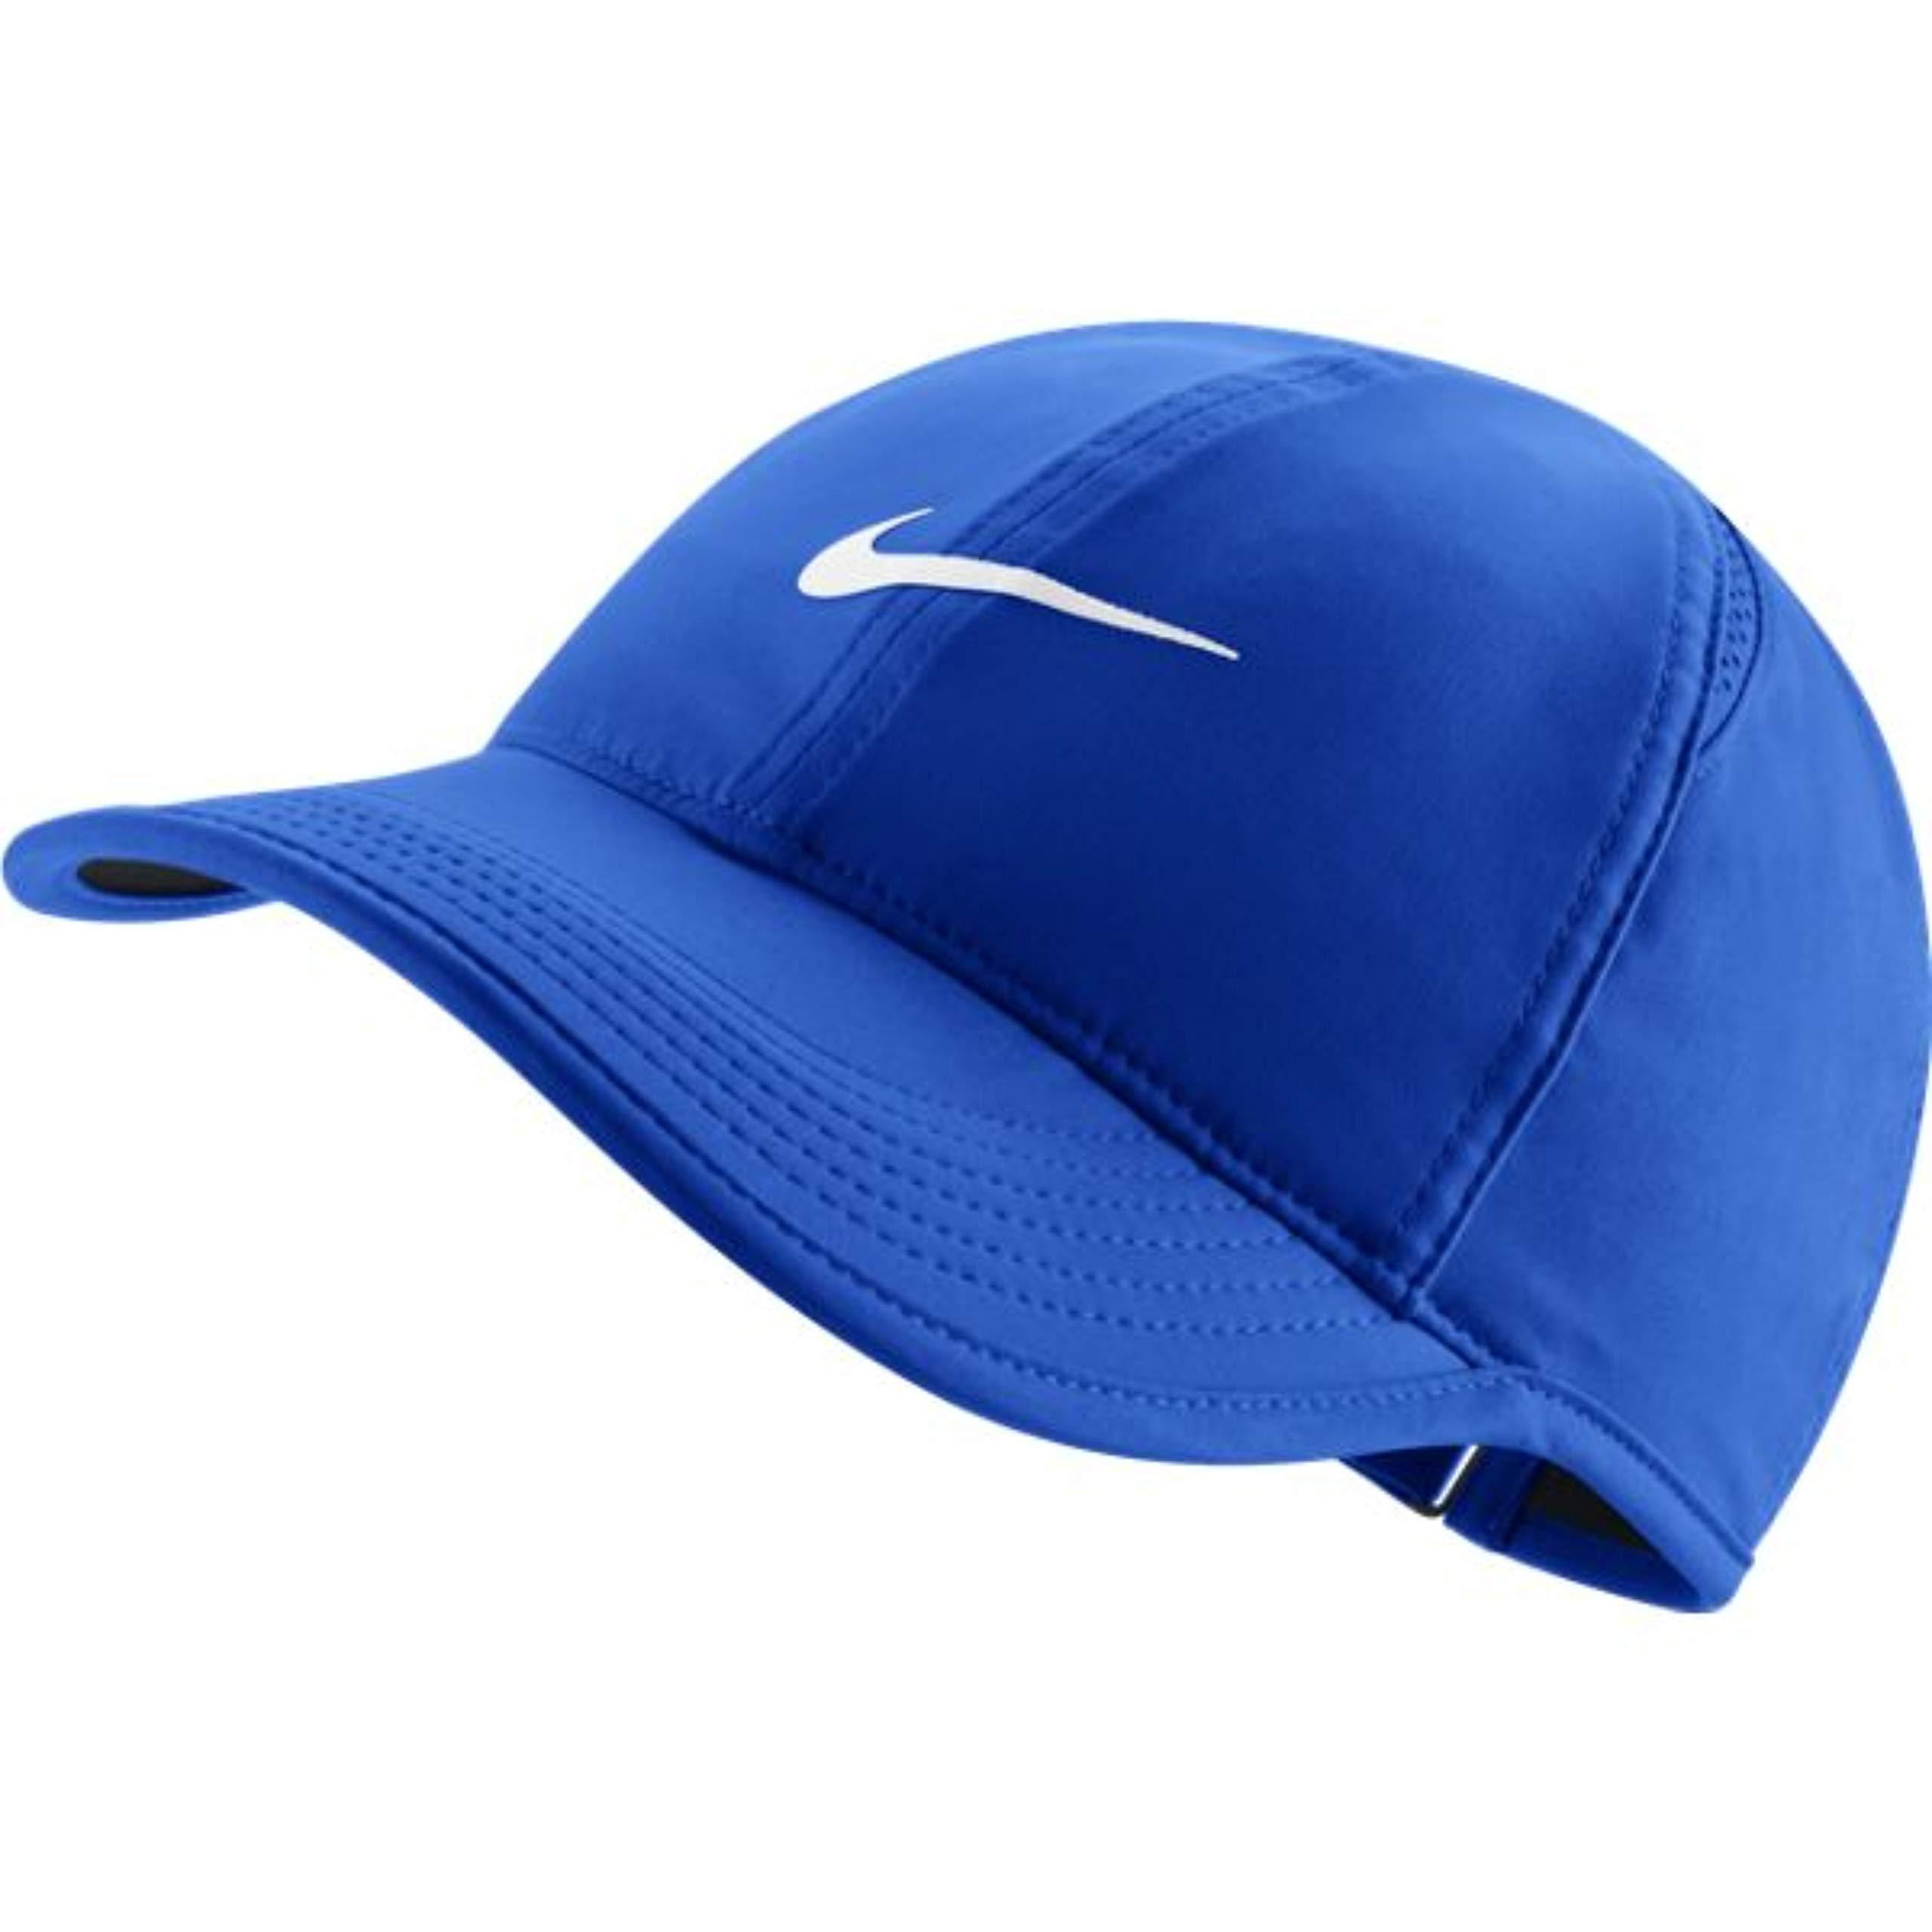 NIKE Womens Featherlite 2.0 Adjustable Hat (Sky-Blue)